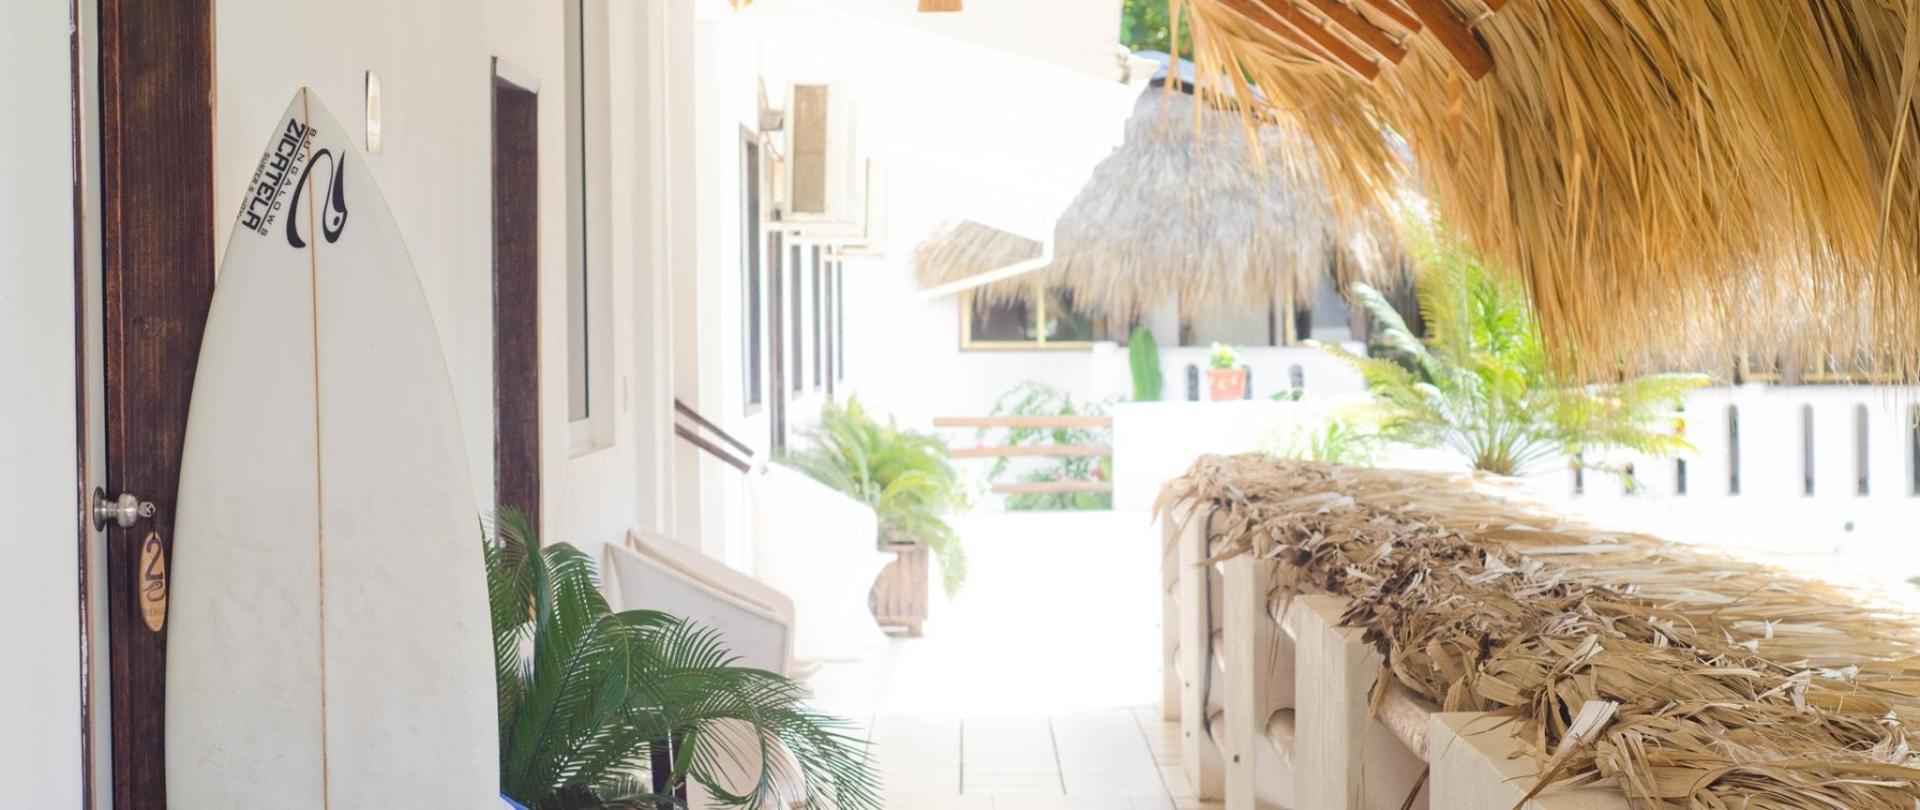 bungalows-zicatela-hotel-2018 (1).jpg